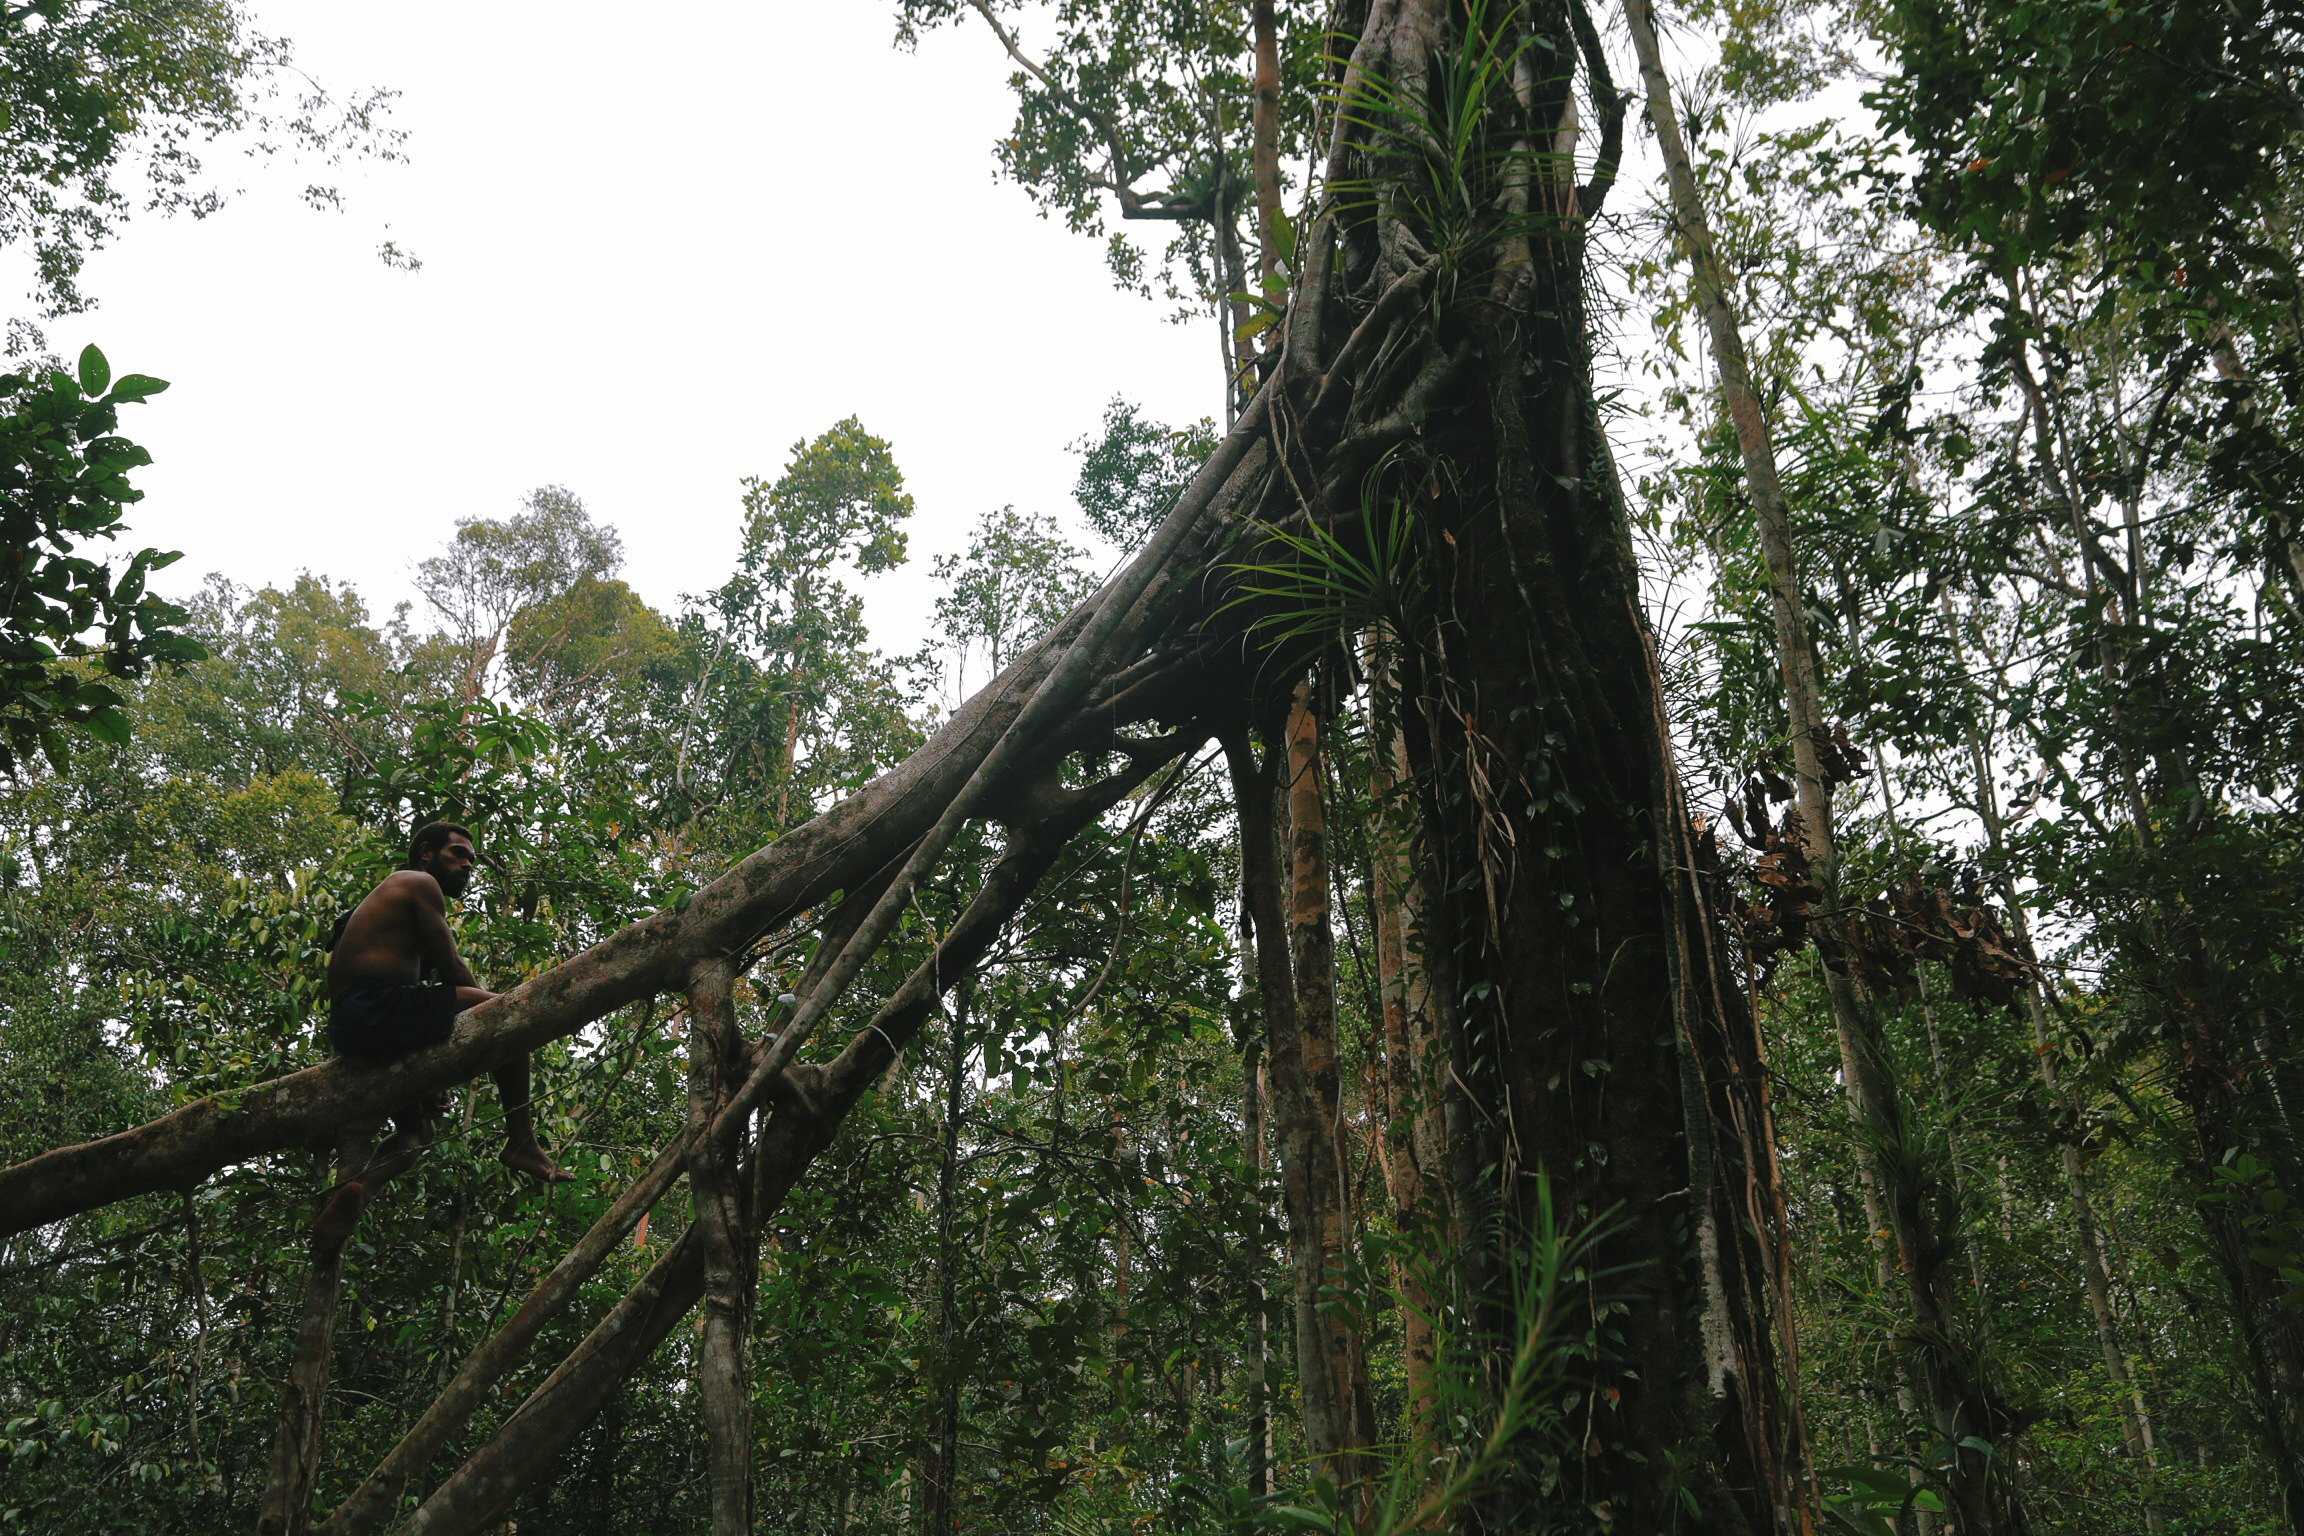 Korowai Journey   Travel the Road    Amazon   Paypal   Credit Card